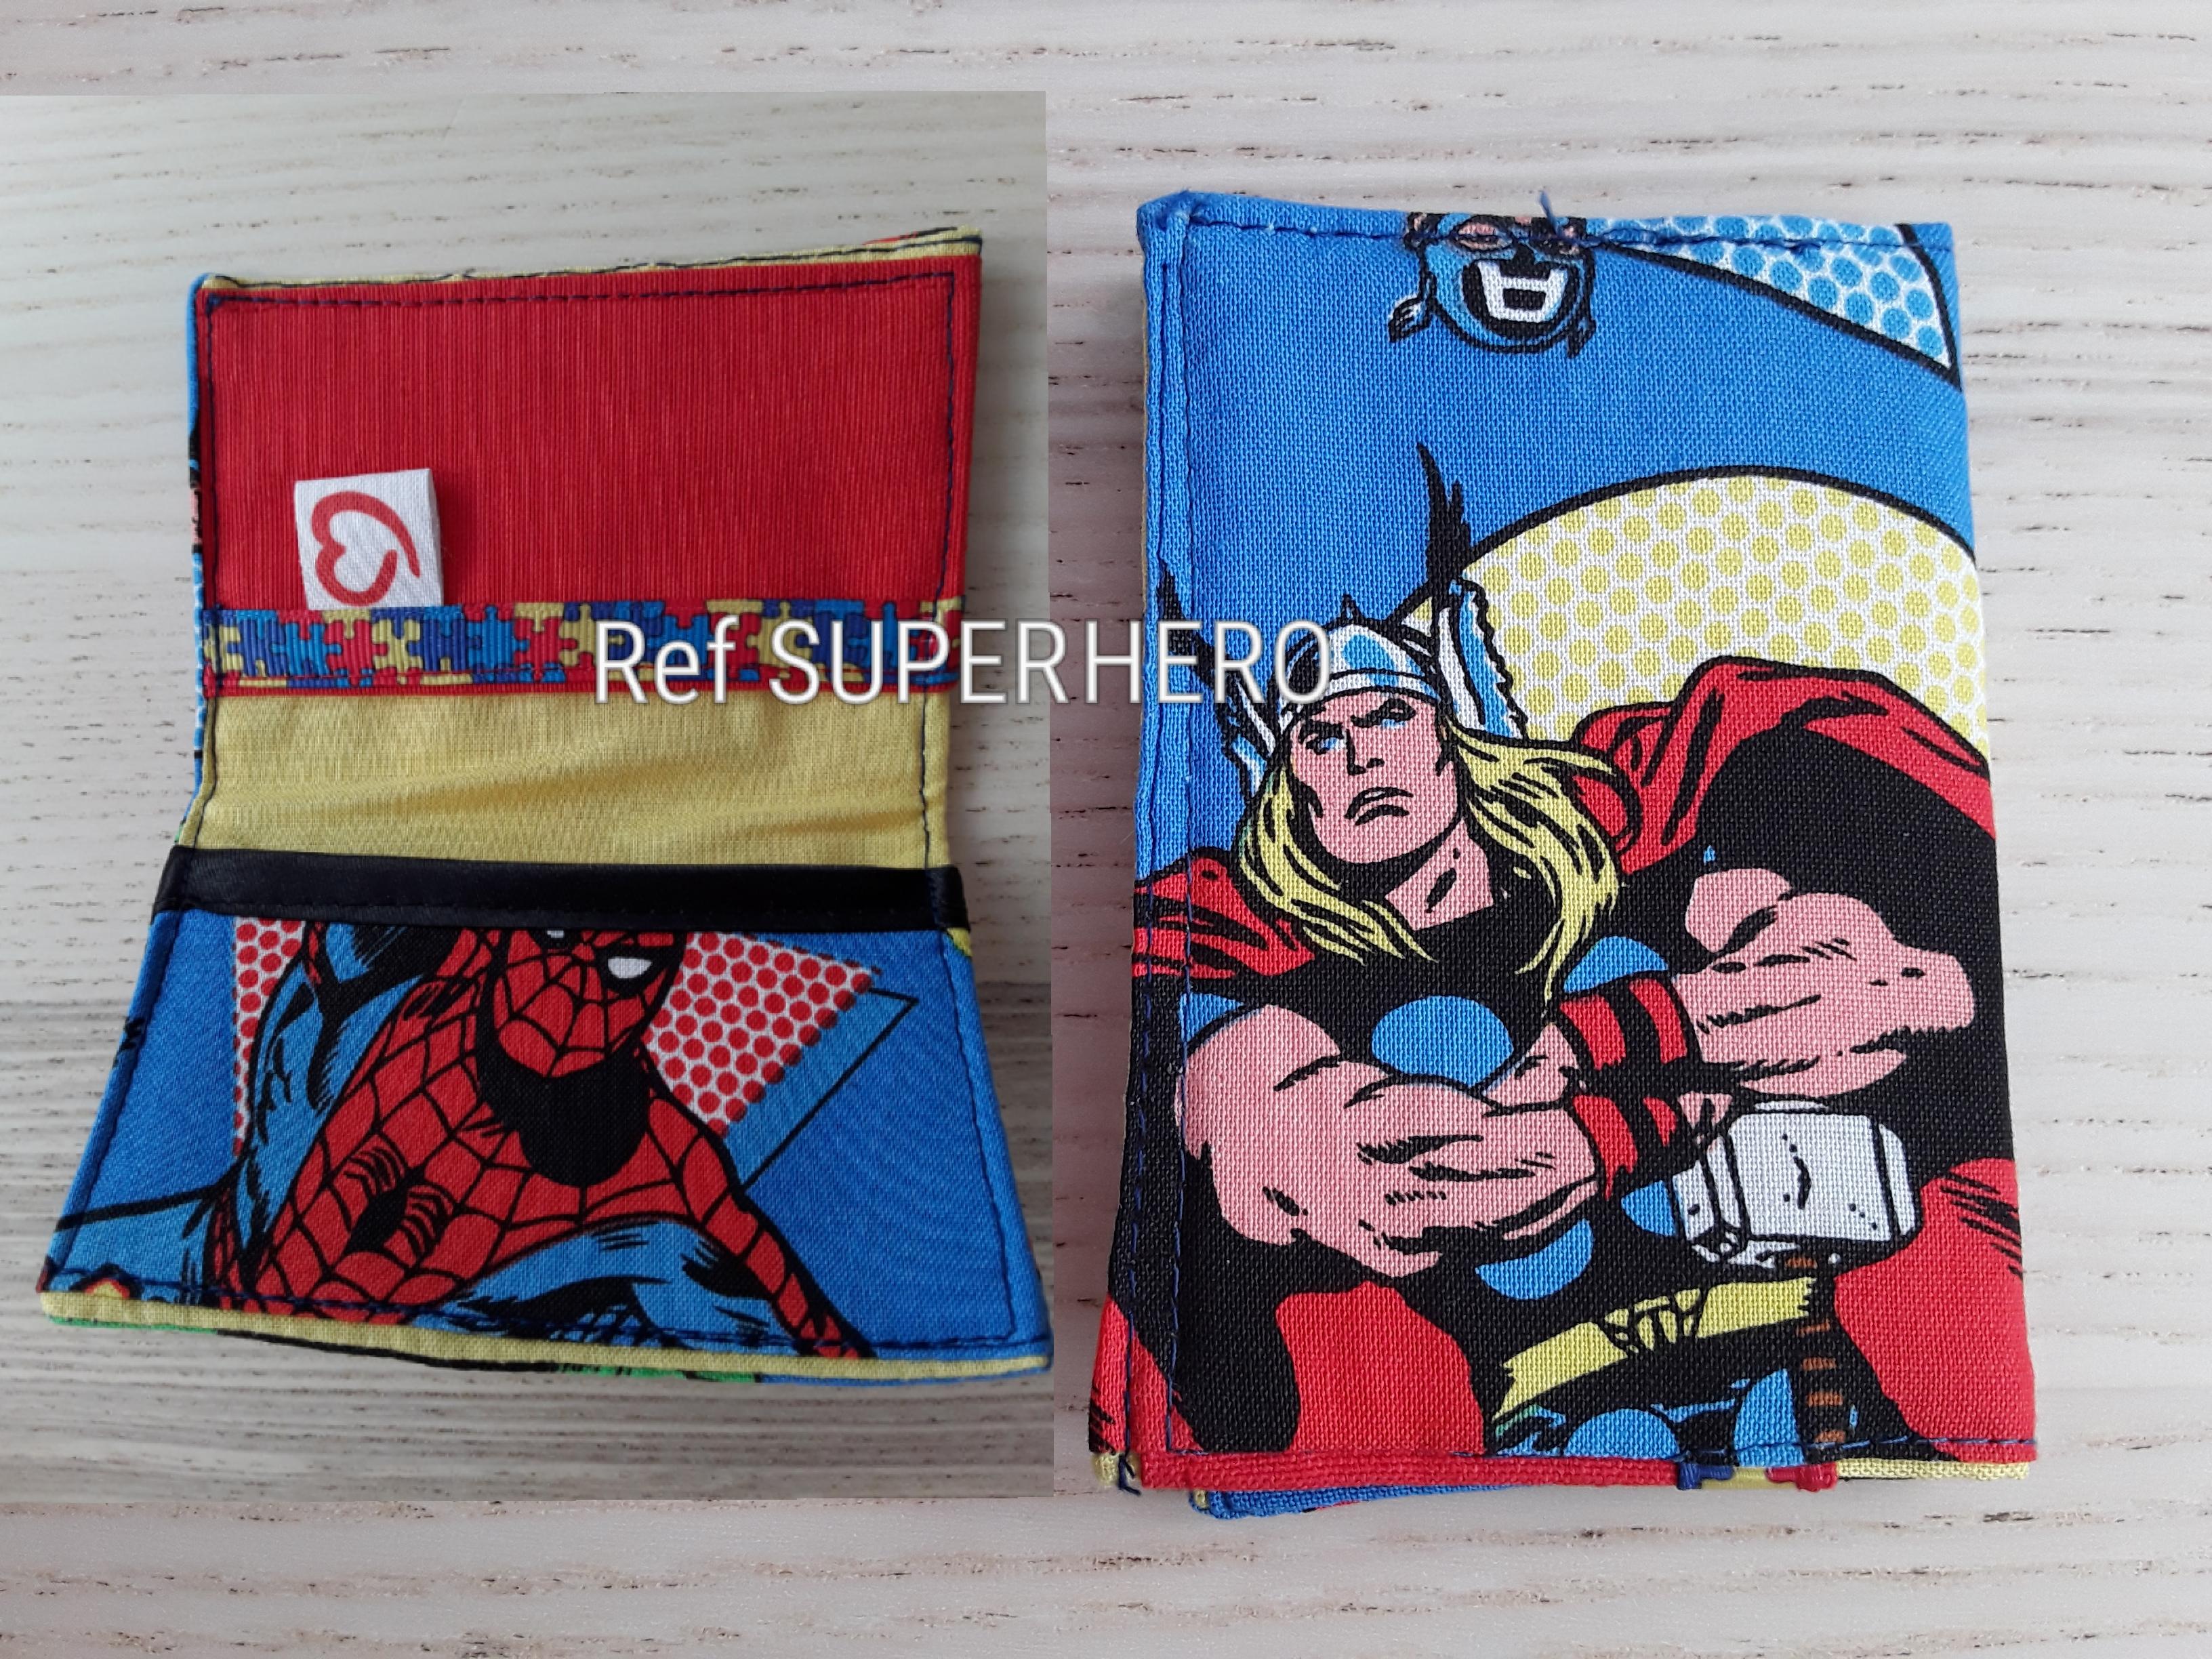 SUPERHERO REF